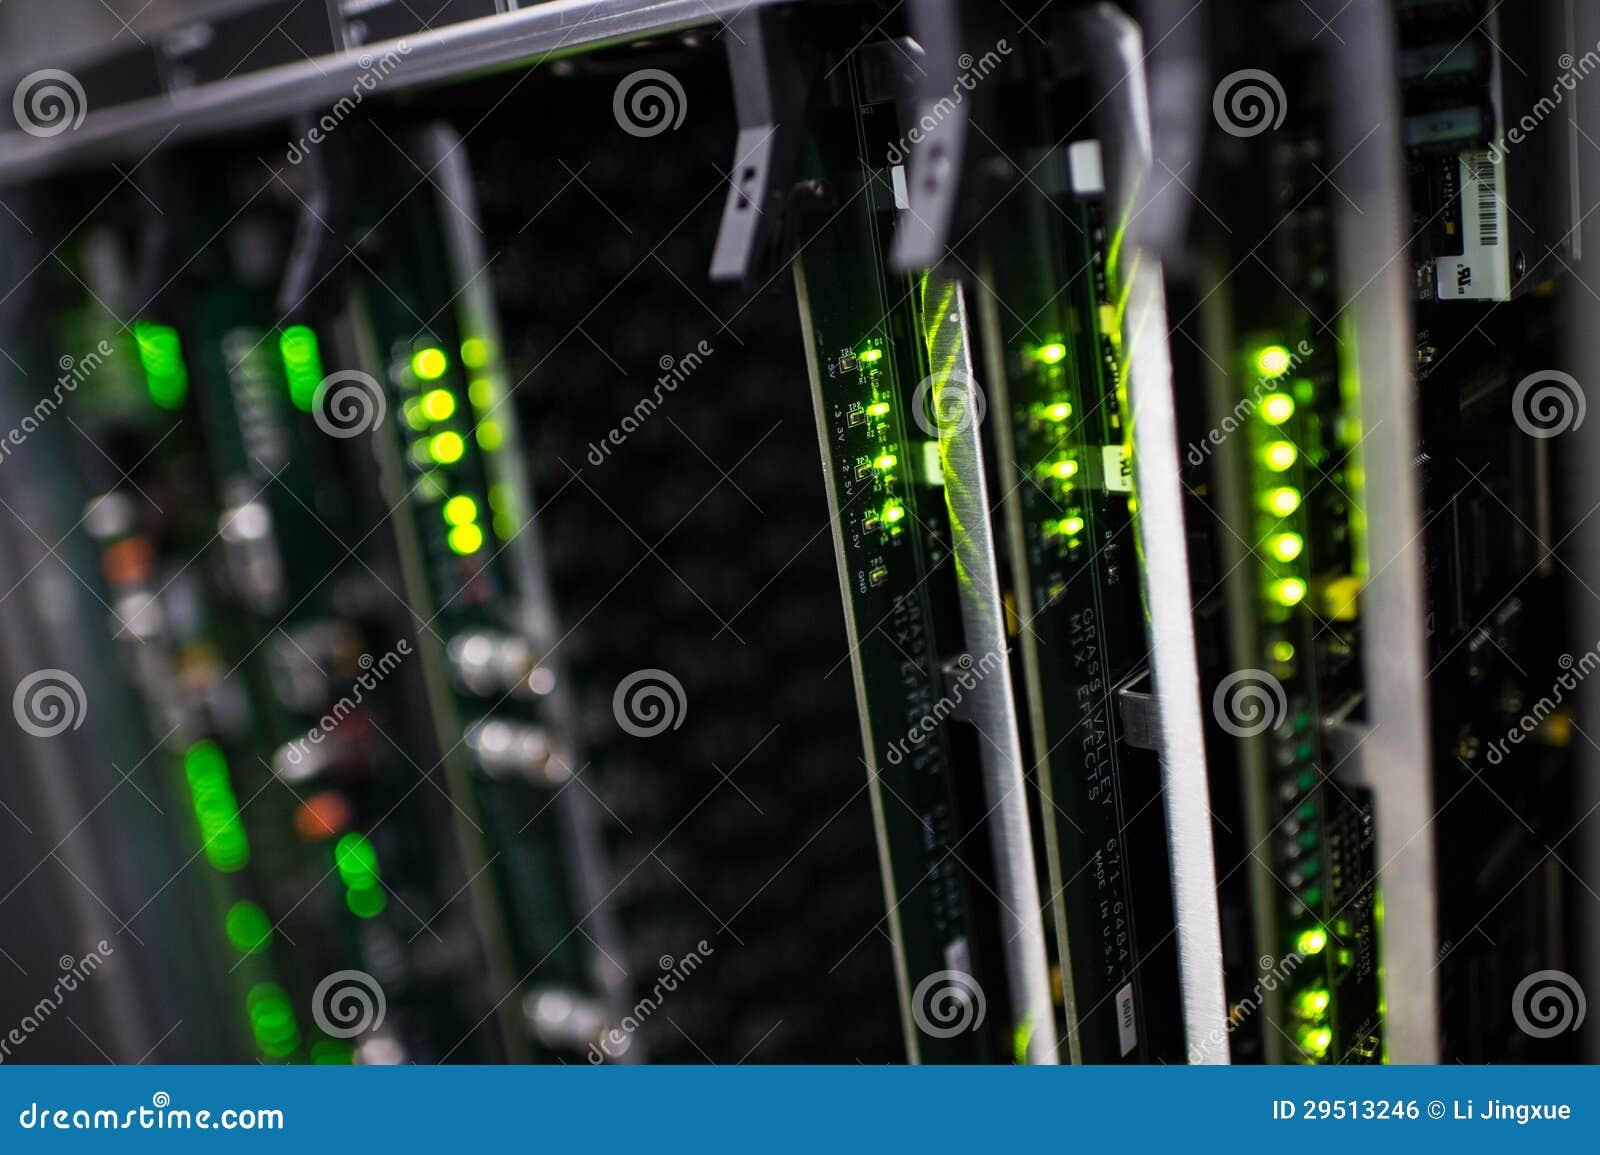 Communication racks